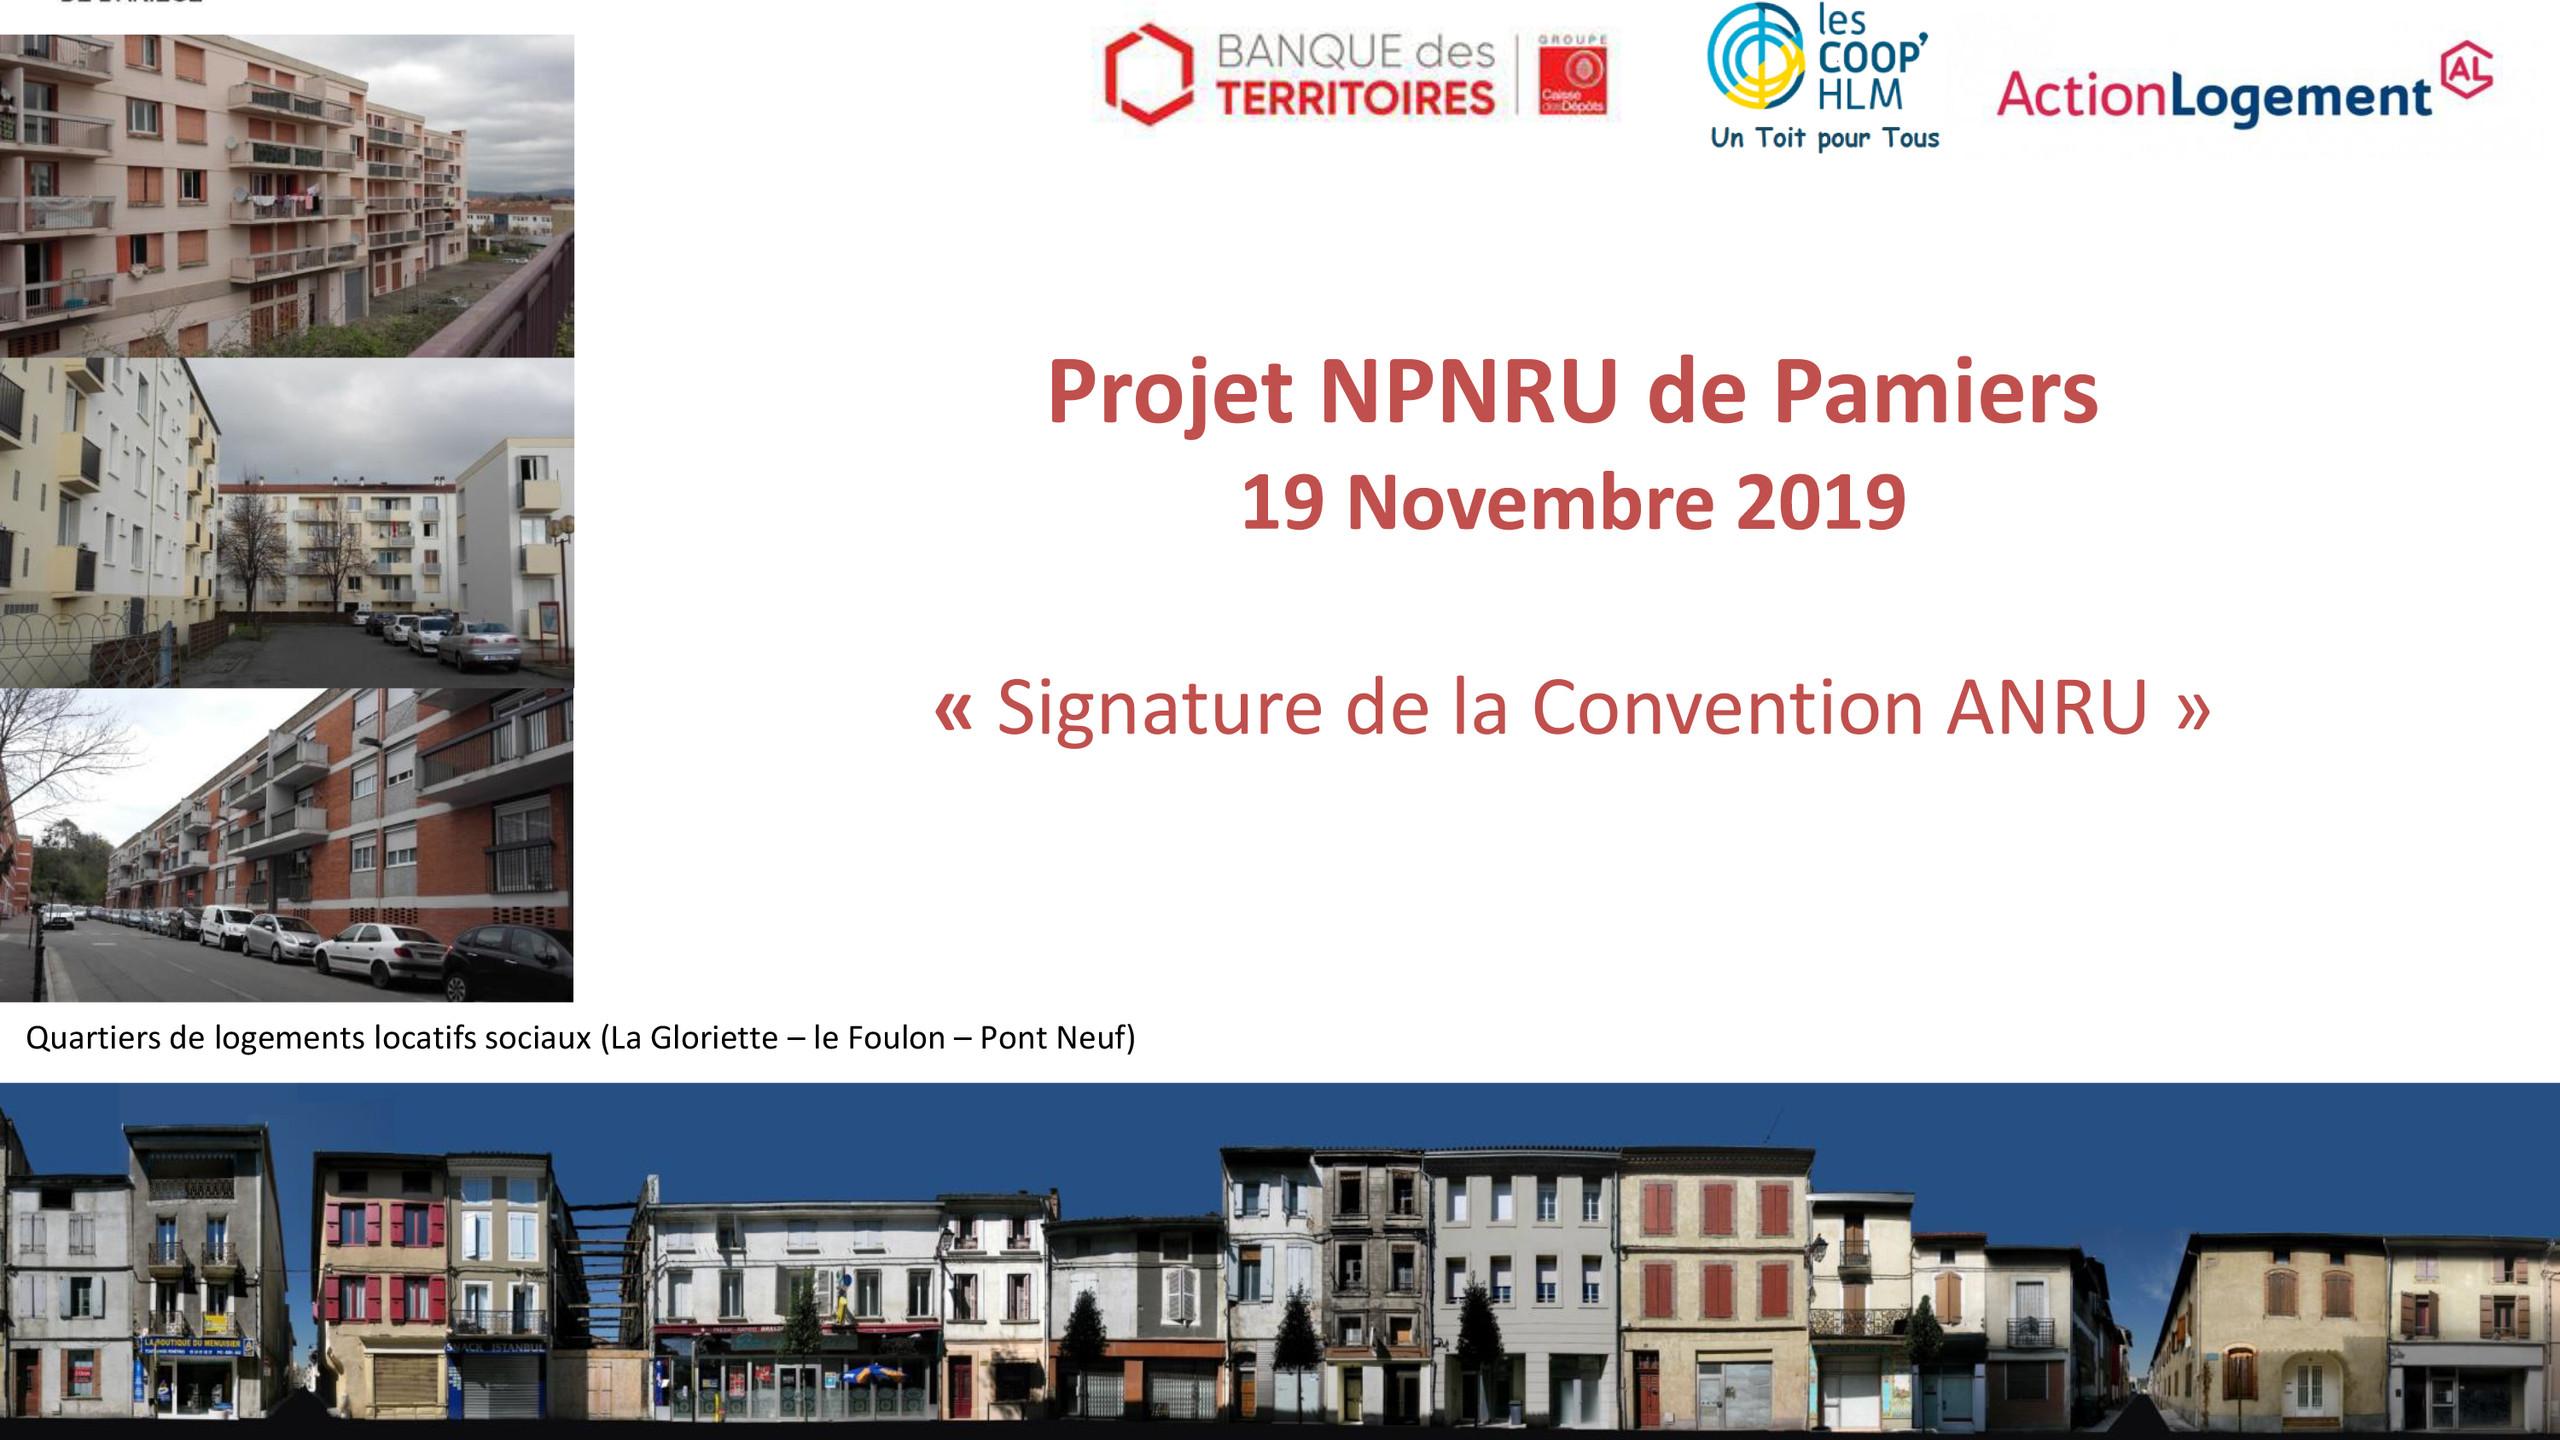 ANRU_Pamiers_Diaporama_Signature_Convent